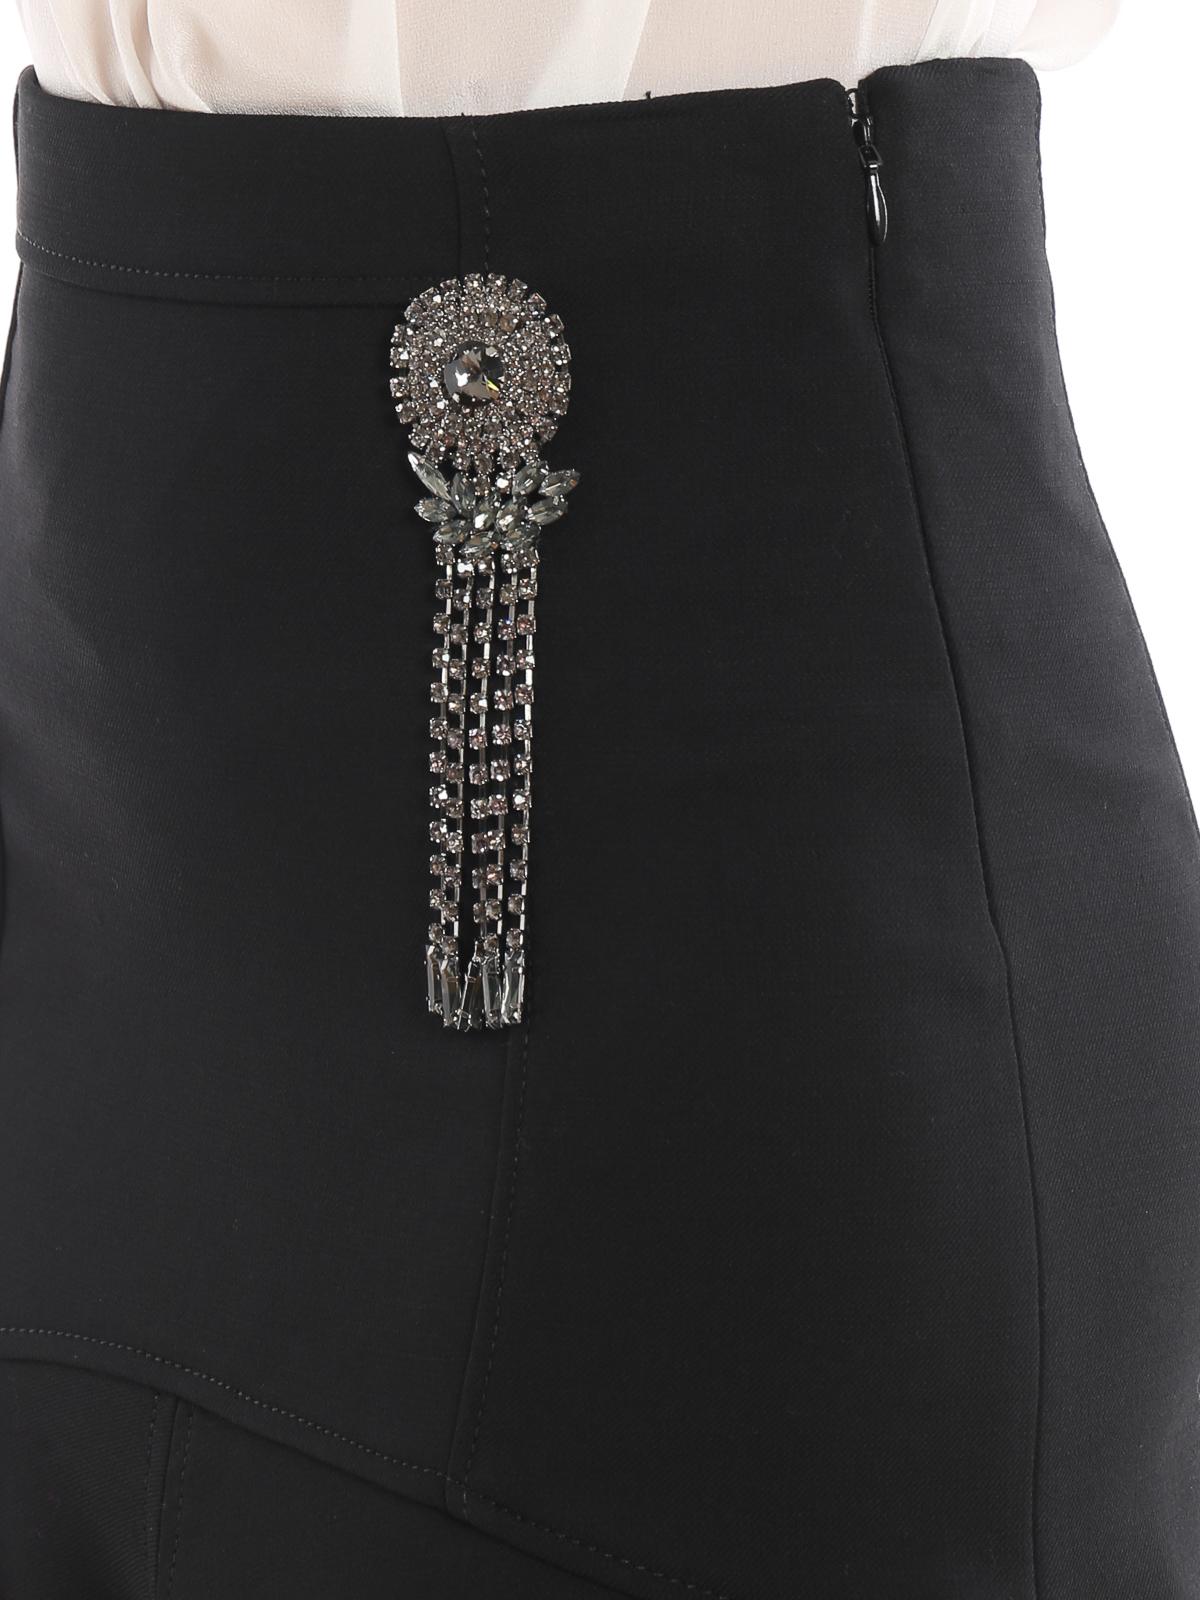 Image result for brooch on waist of skirt